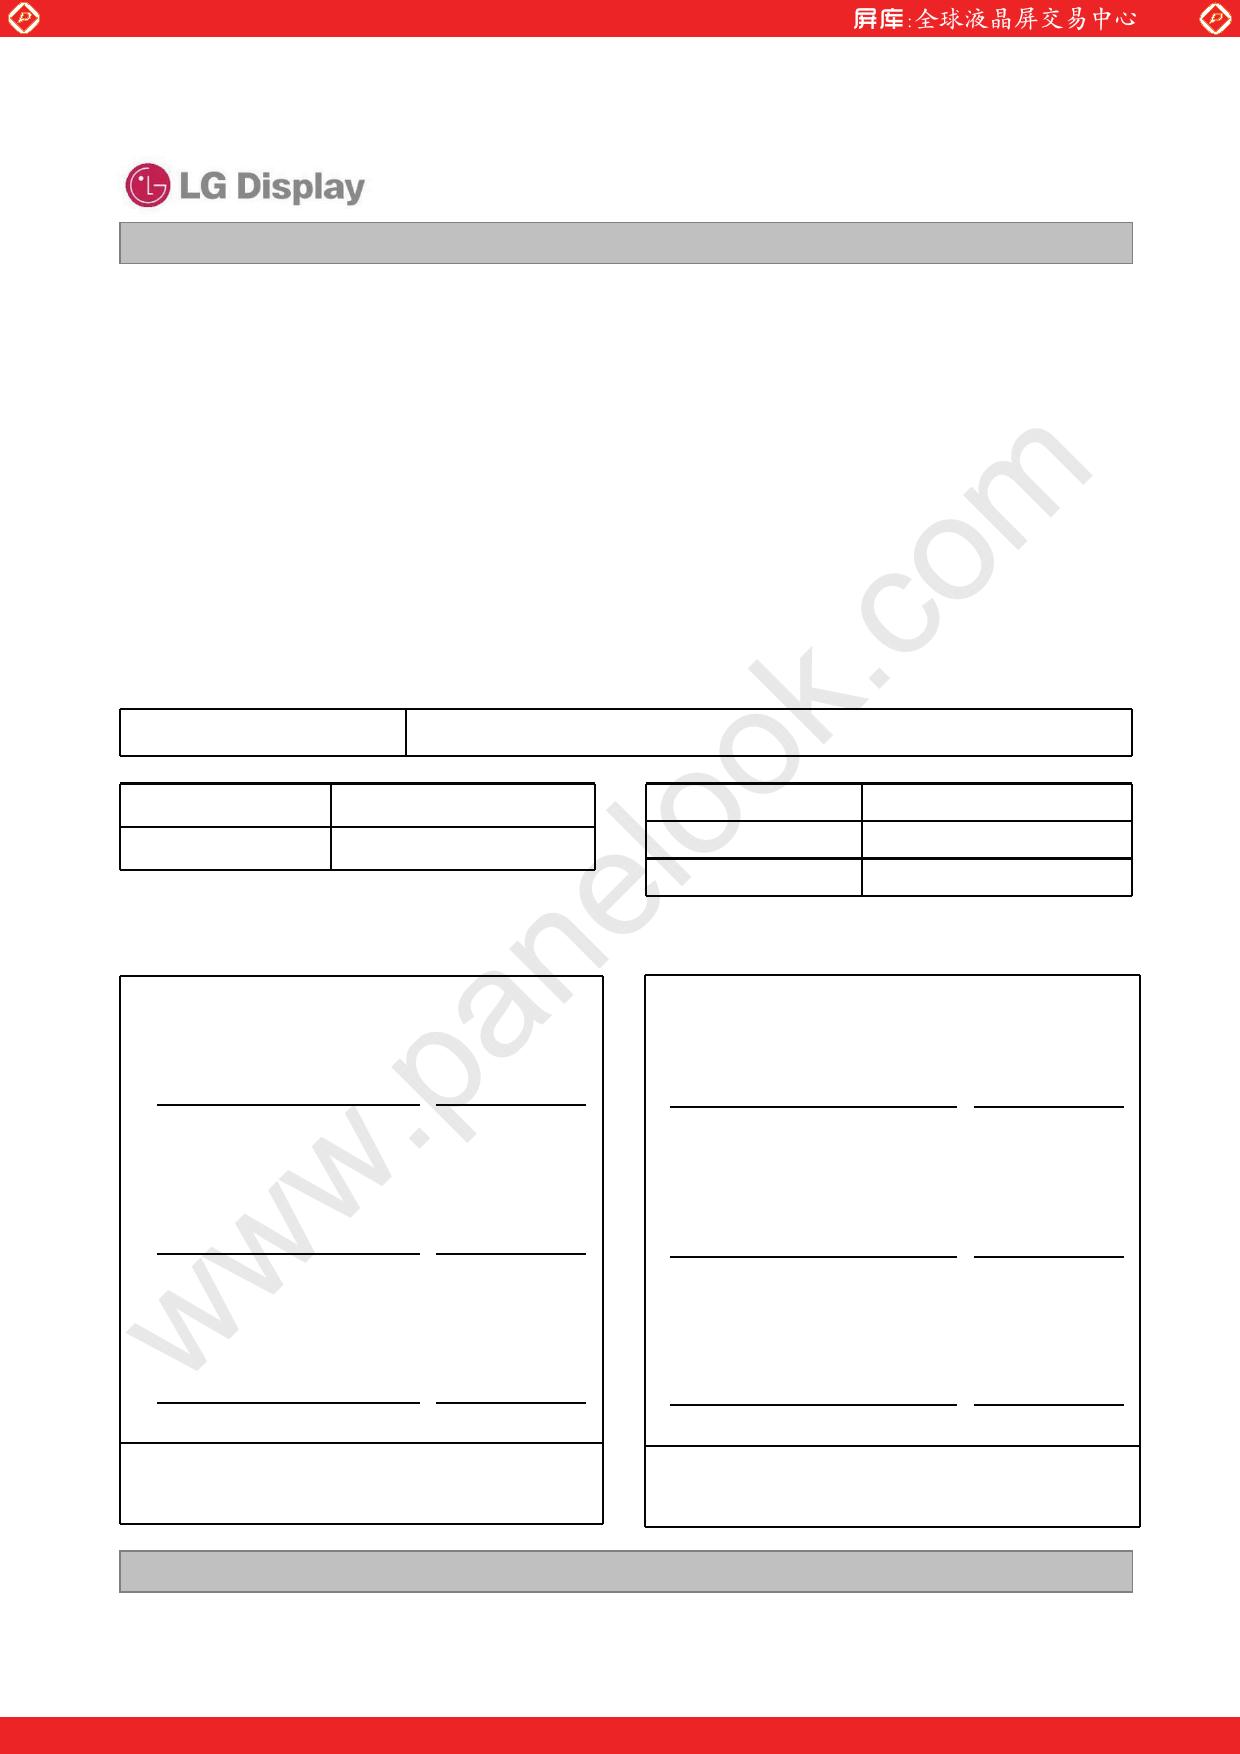 LC320DUE-SFR1 datasheet